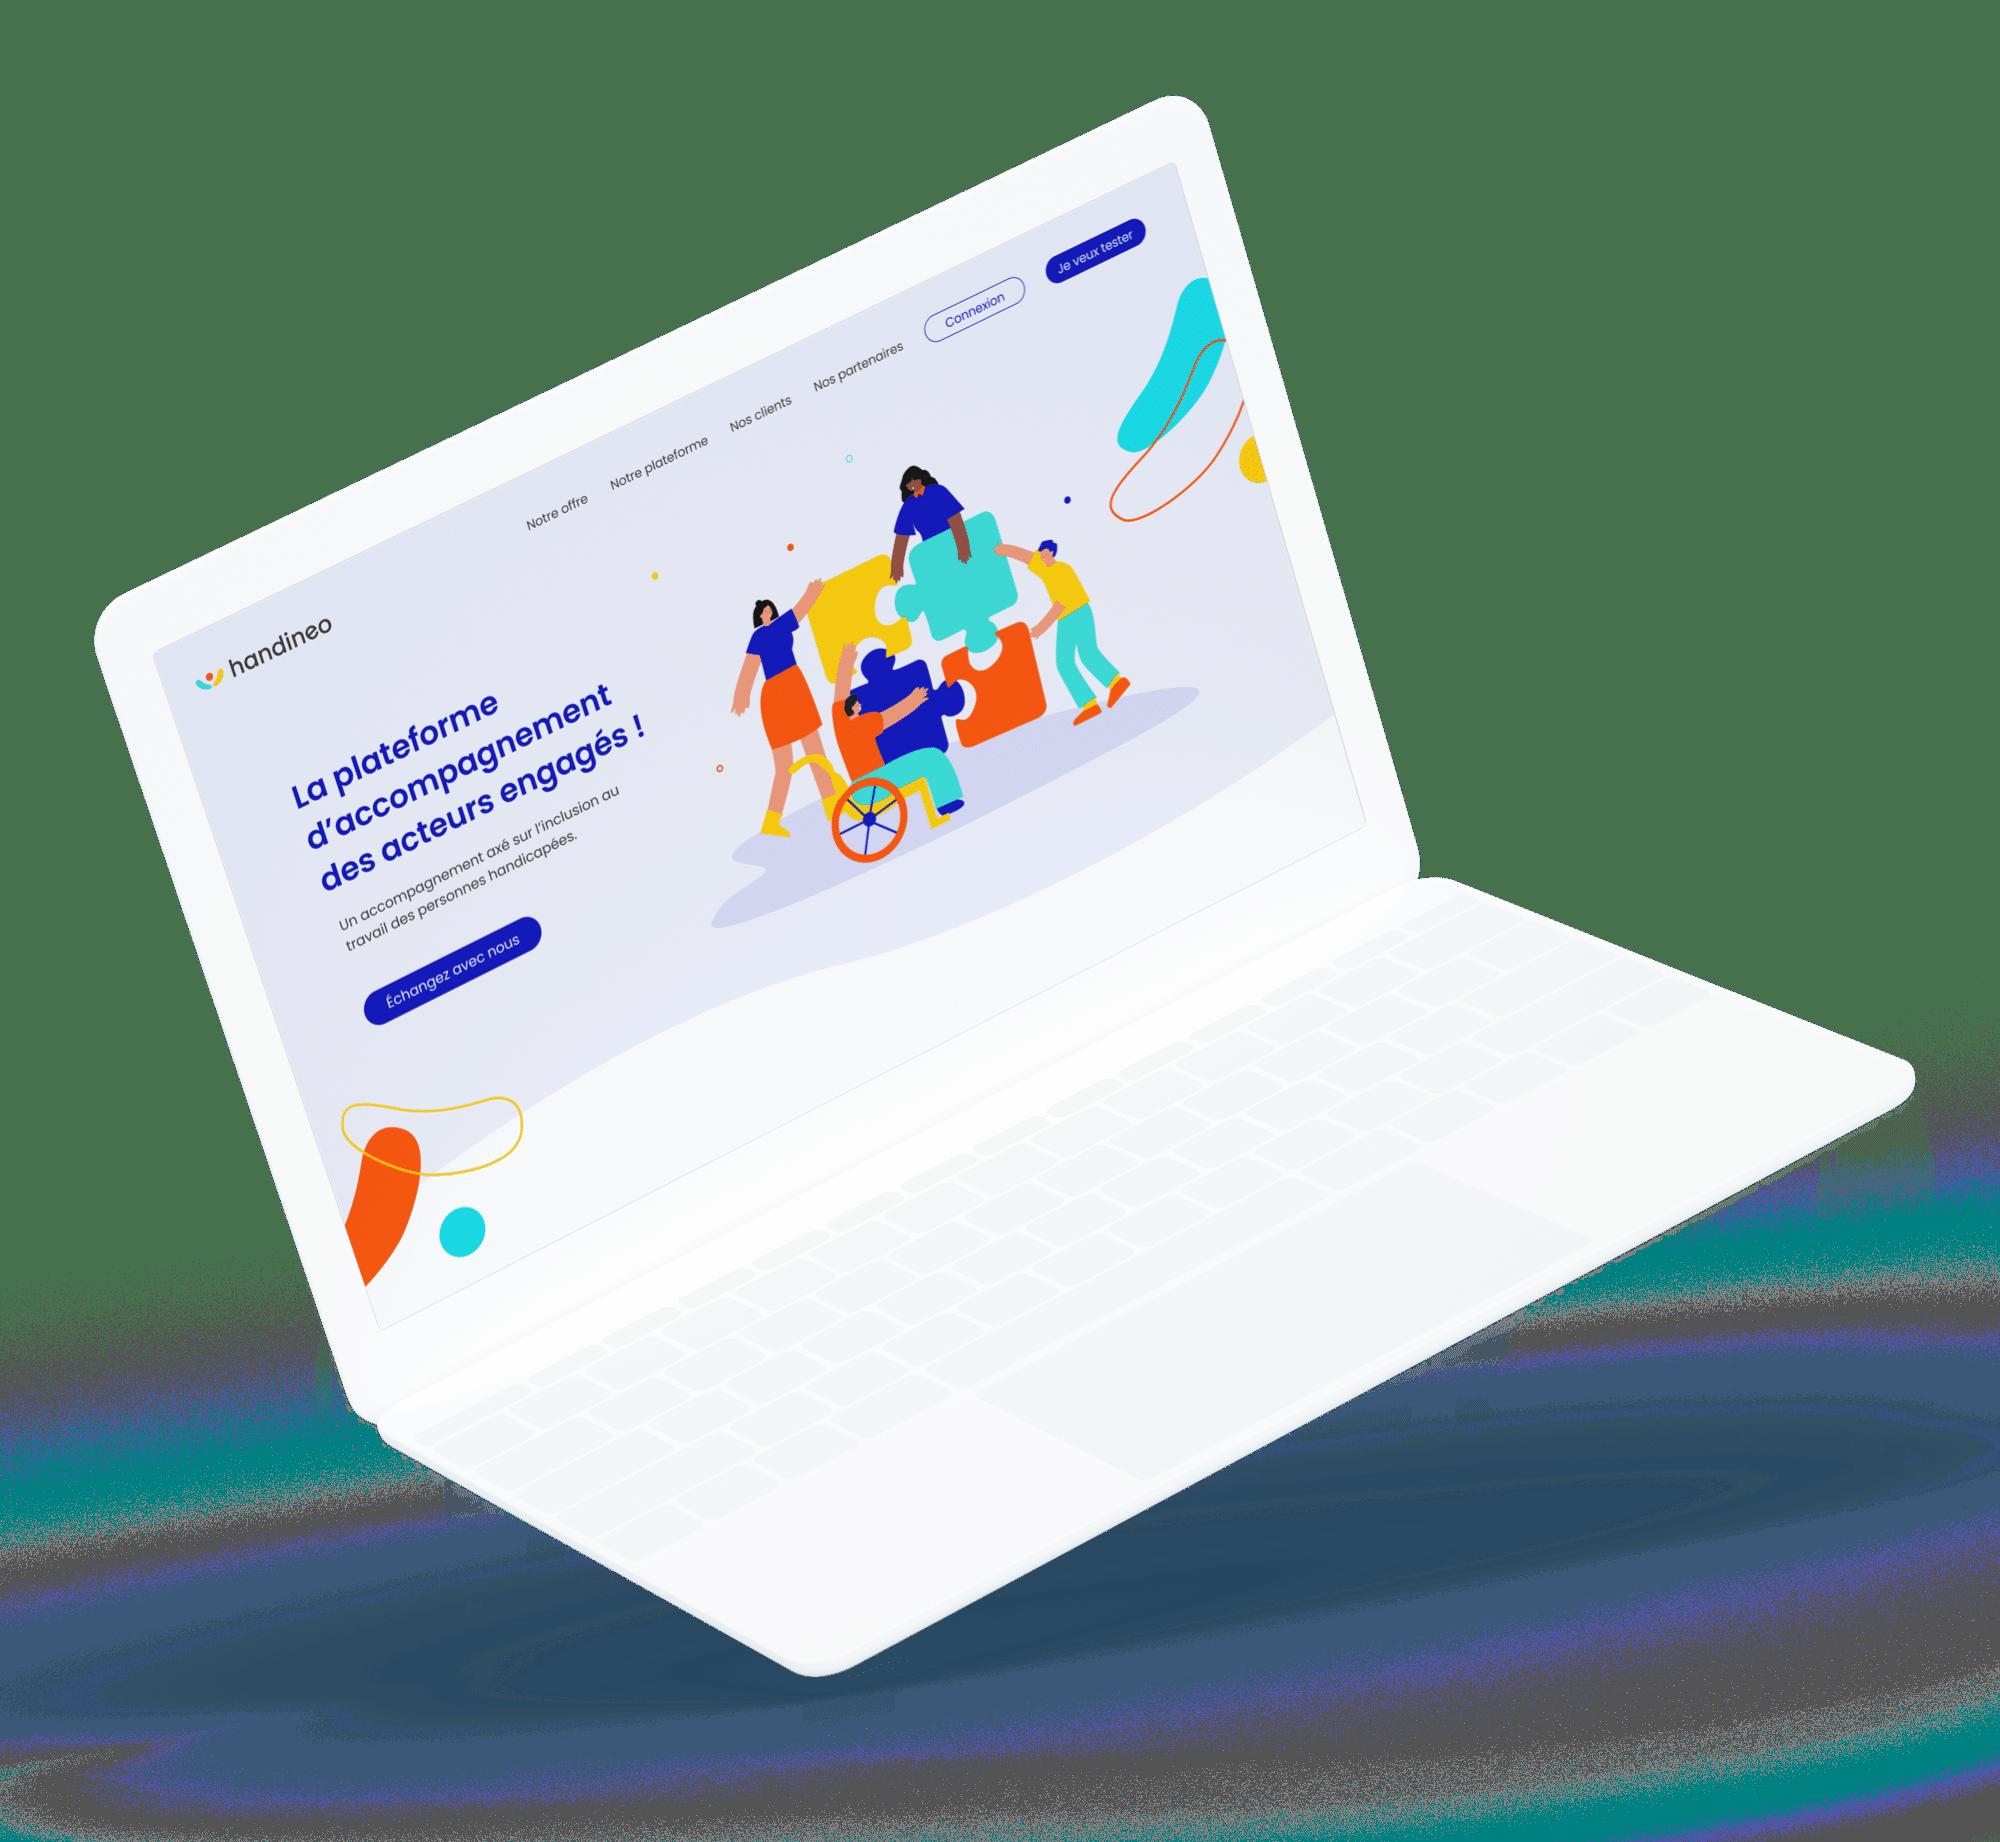 Handineo (plateforme) - plateforme desktop